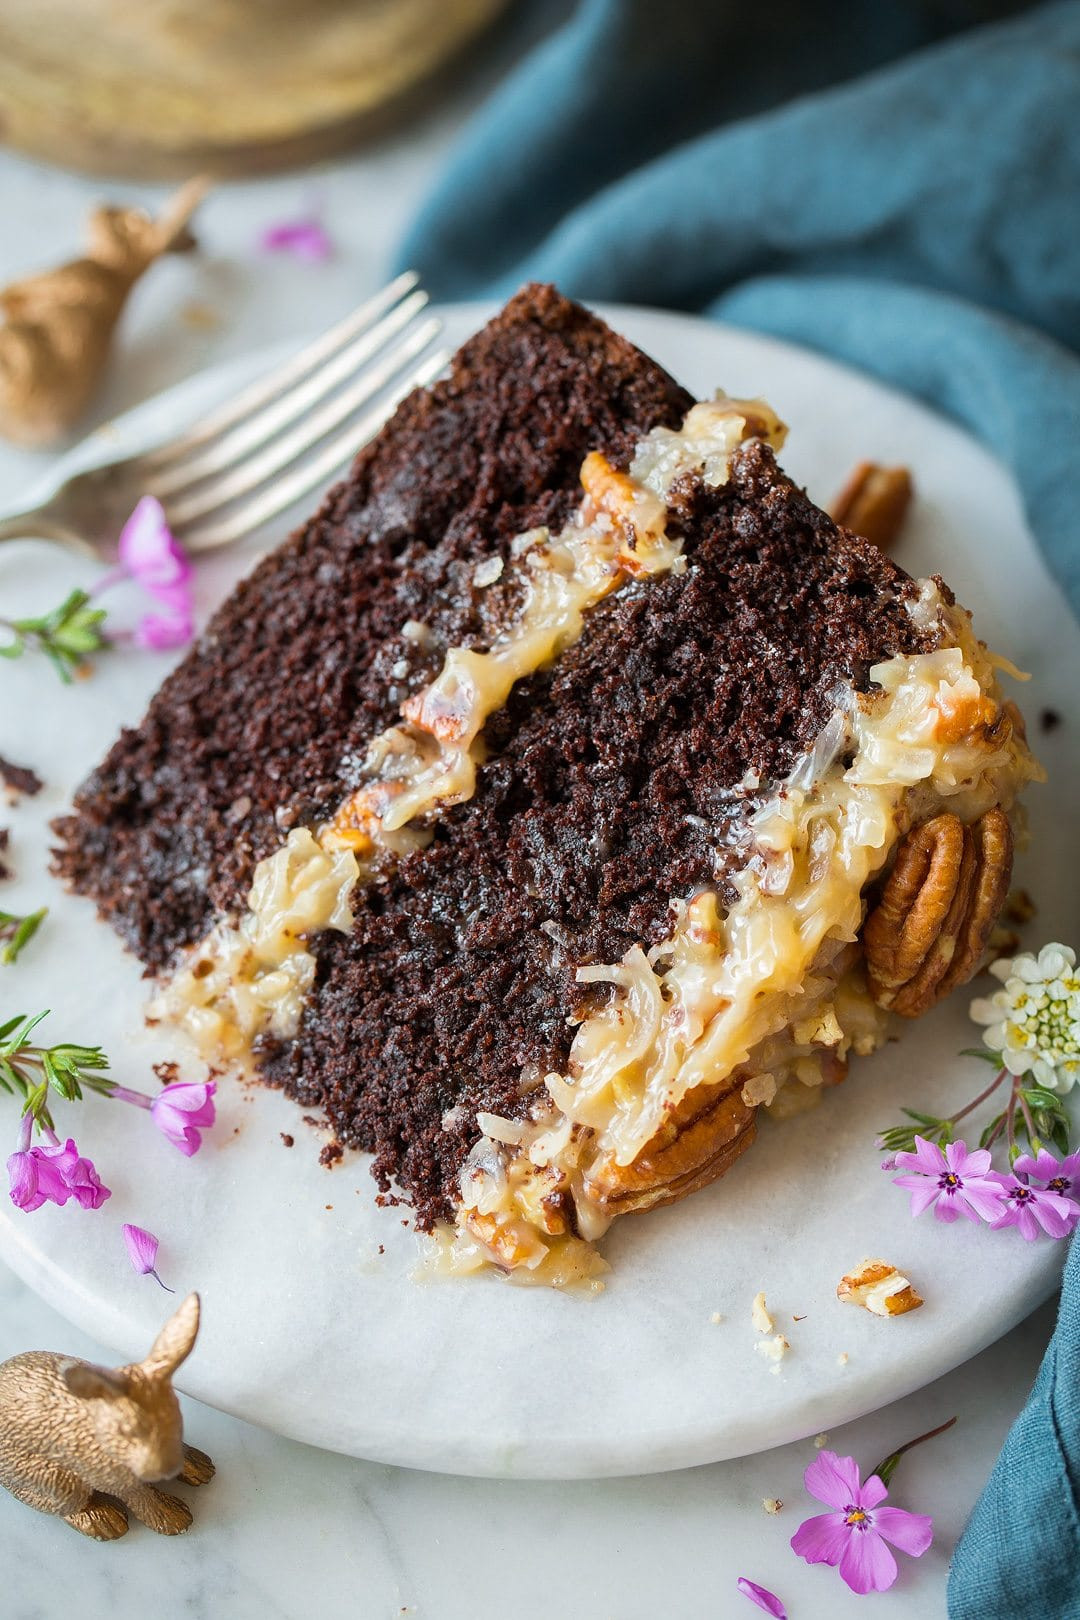 Best German Chocolate Cake  German Chocolate Cake The BEST  Cooking Classy